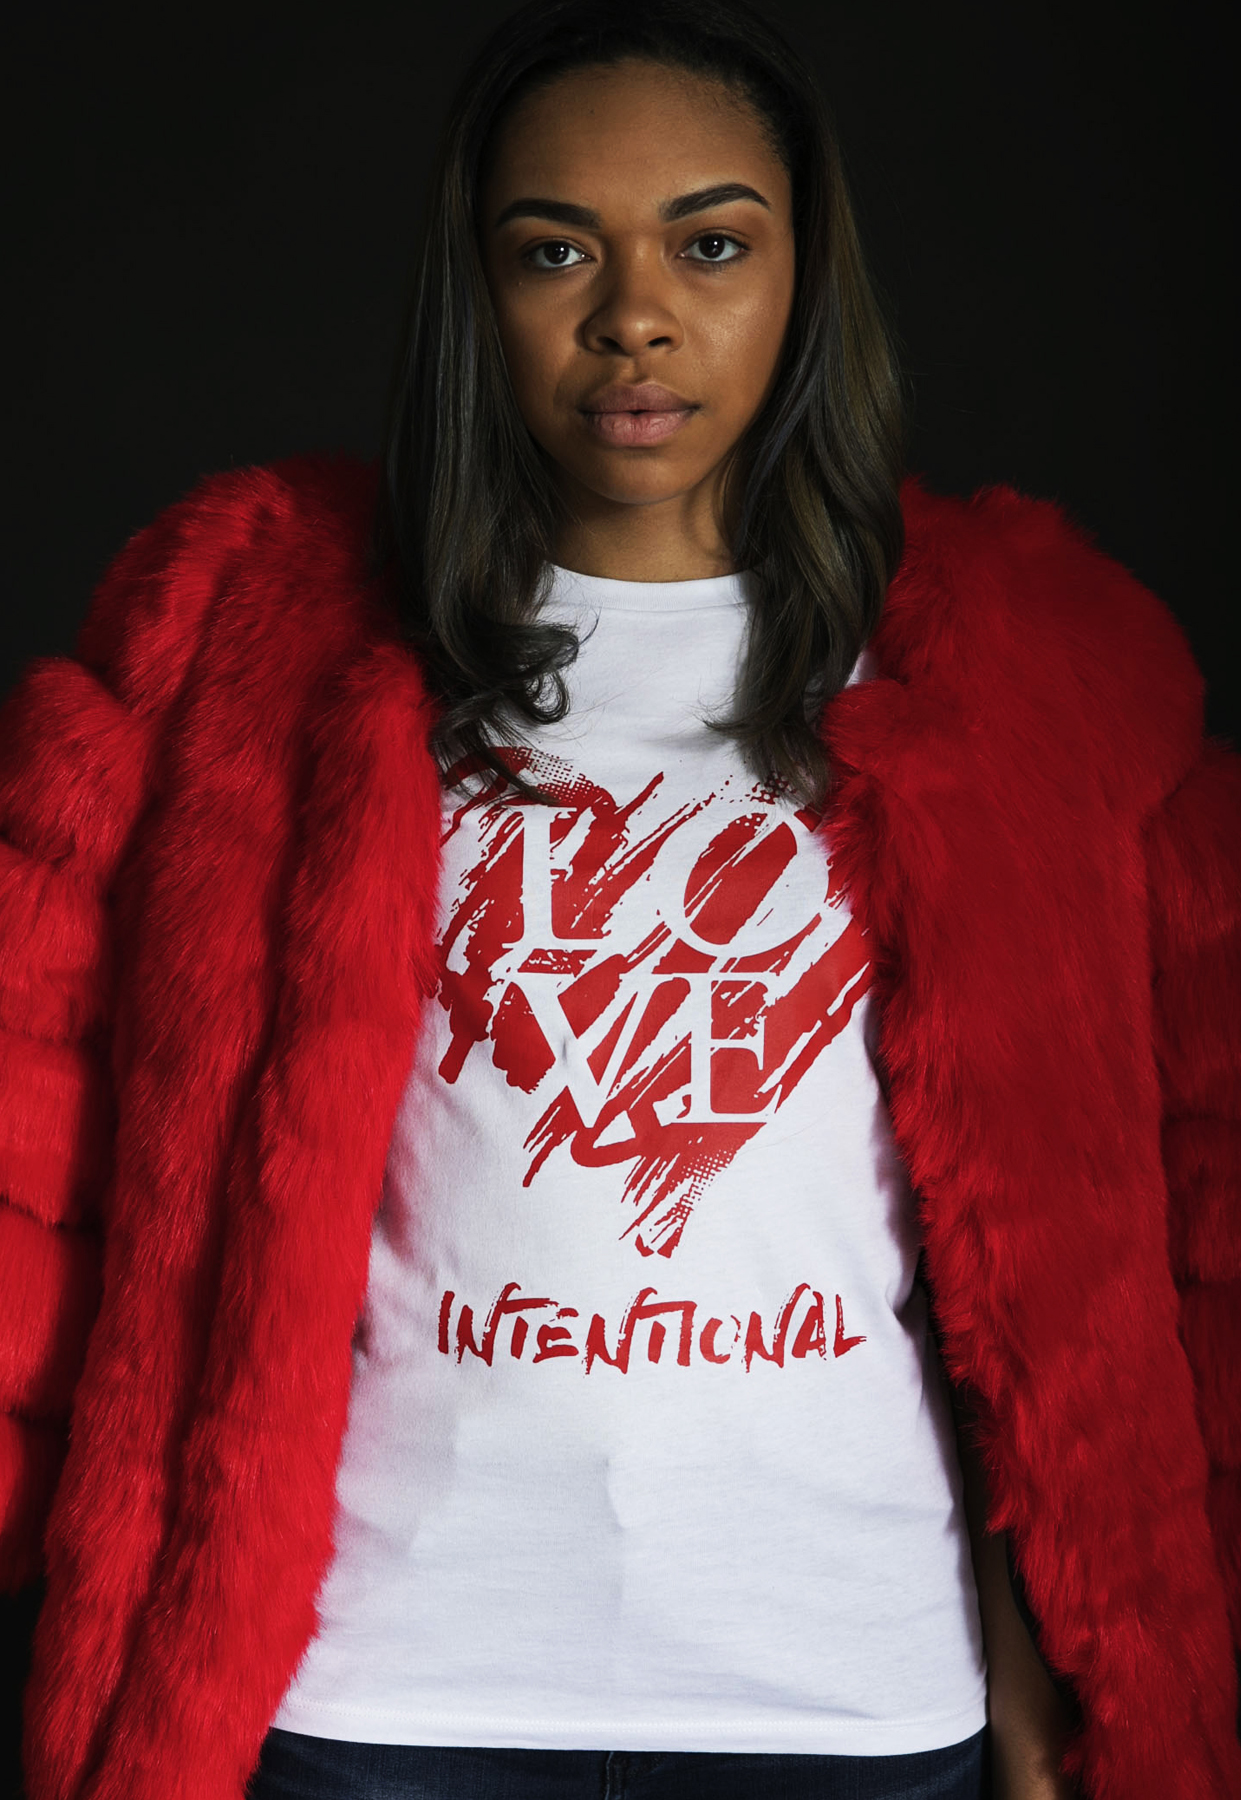 Love International Tee - $27 (Fur not included)